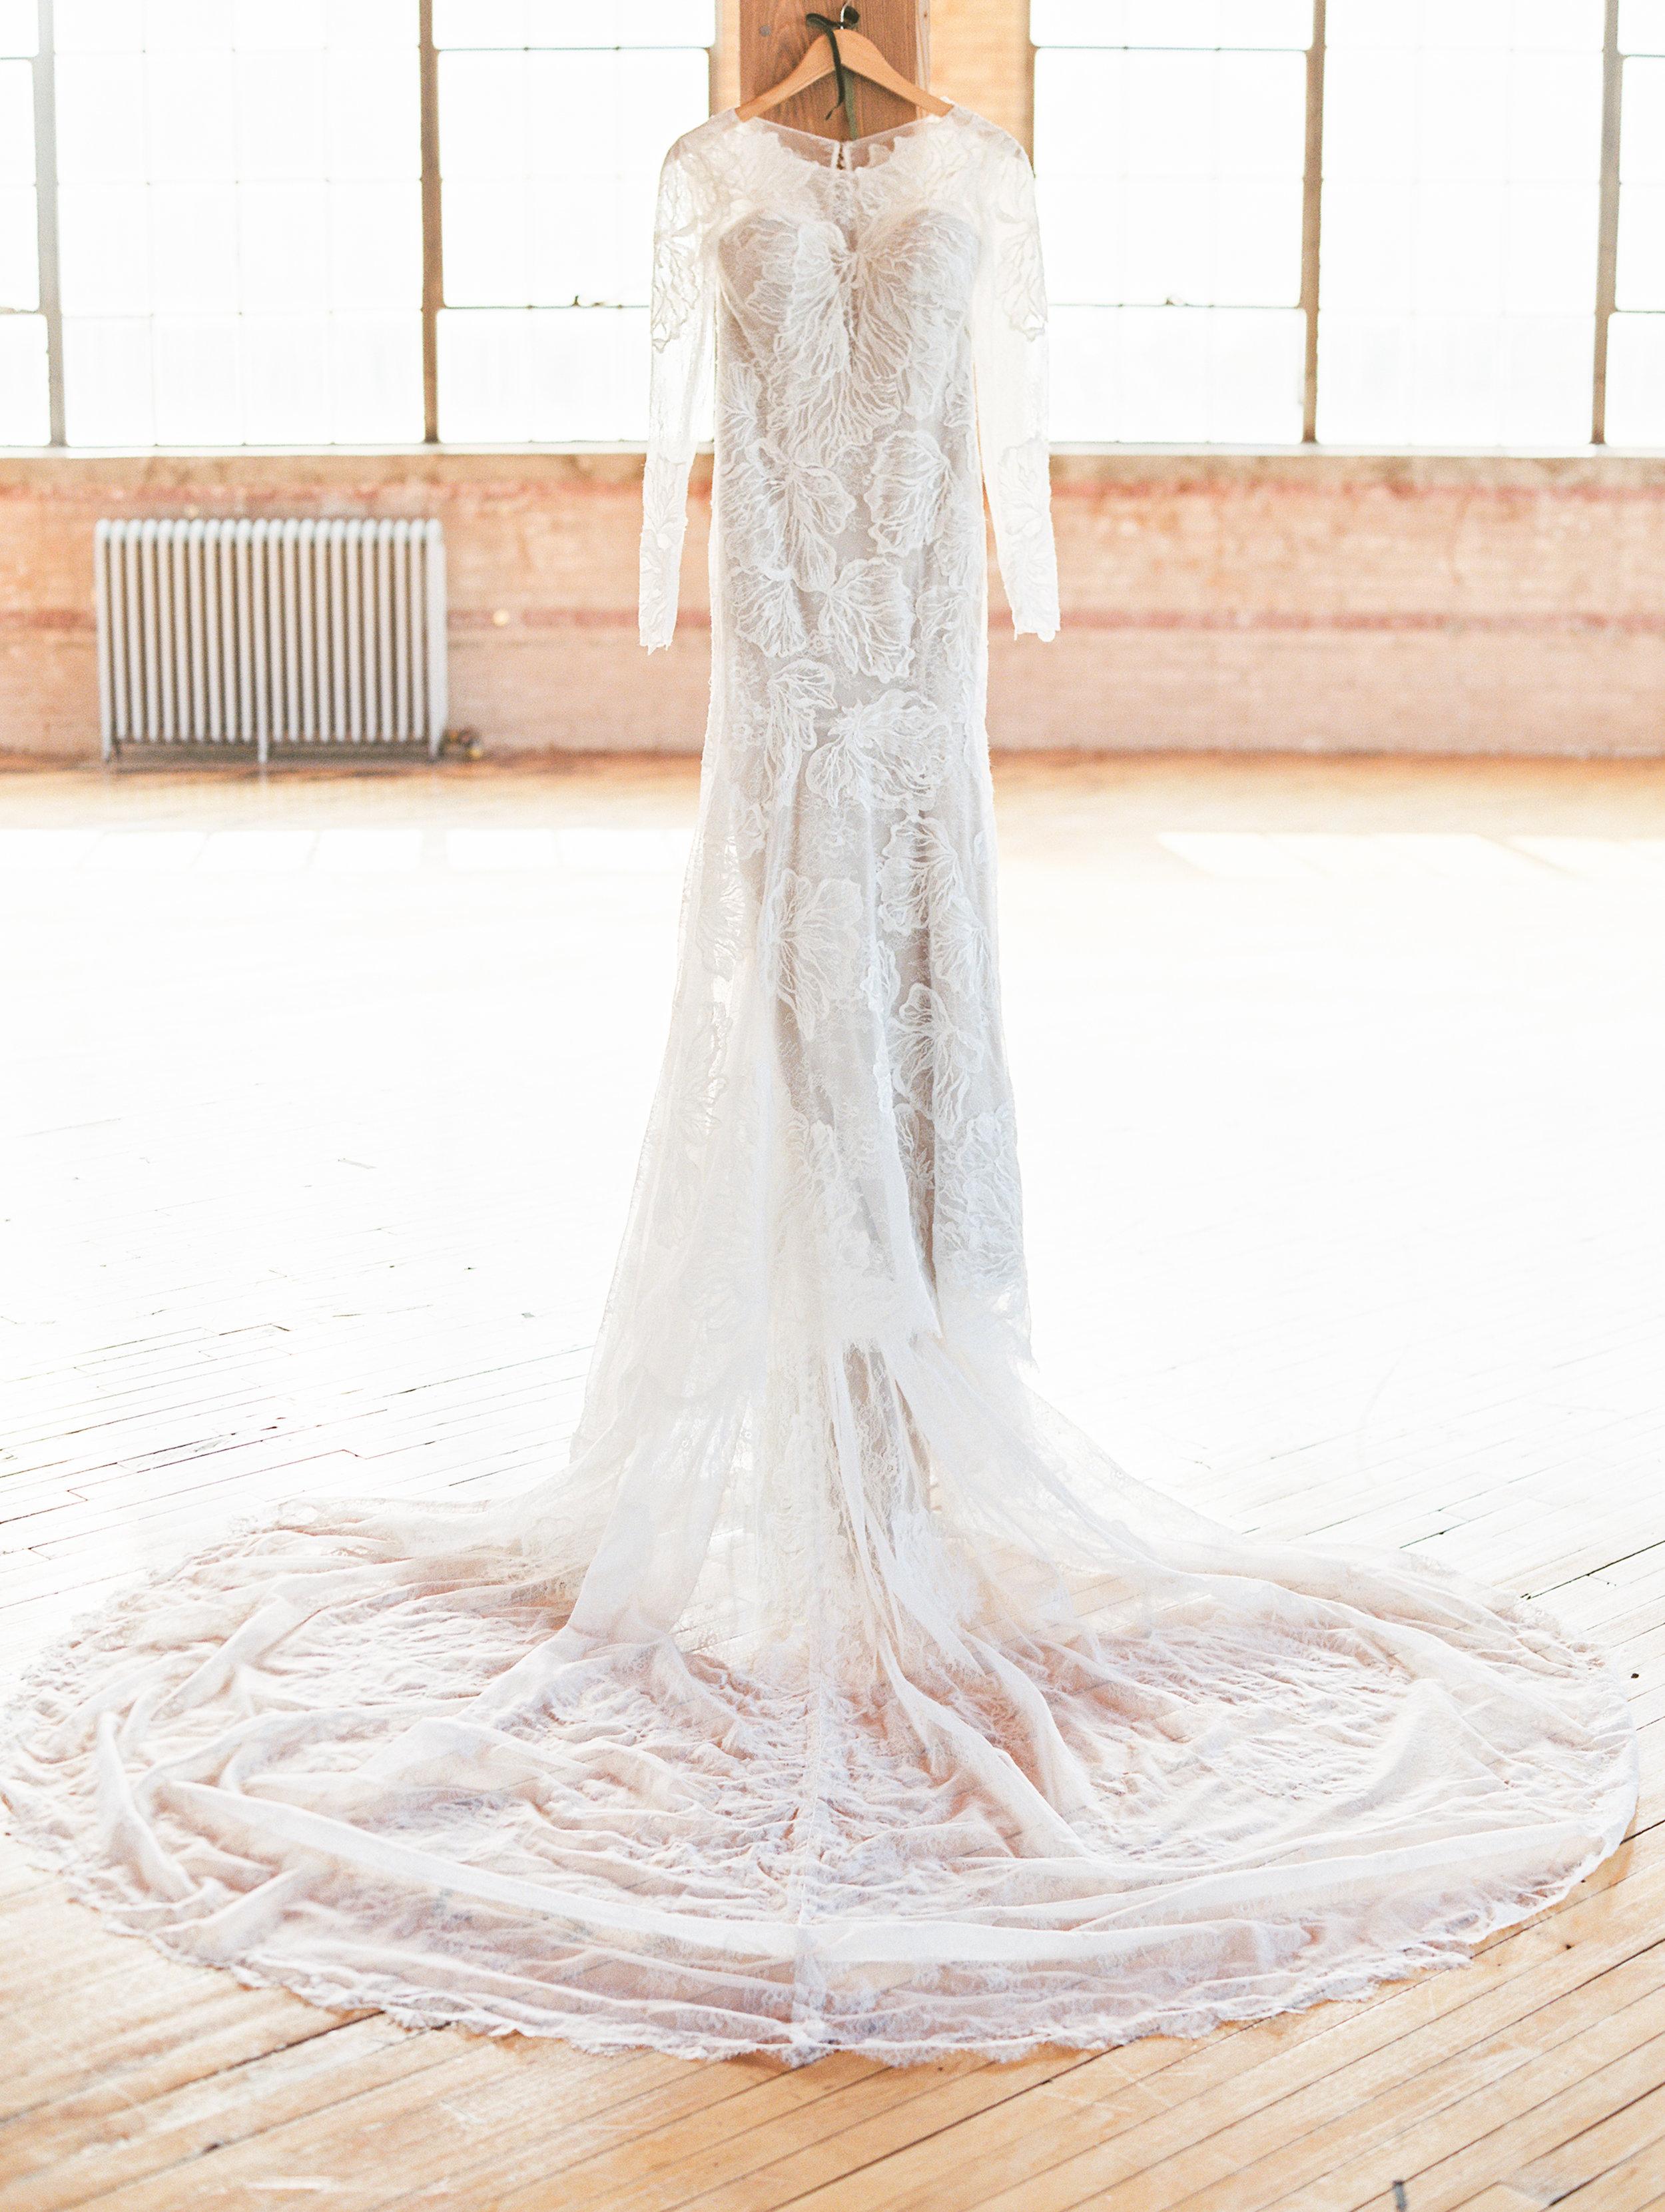 Vogelzang+Wedding+Details+b-22.jpg